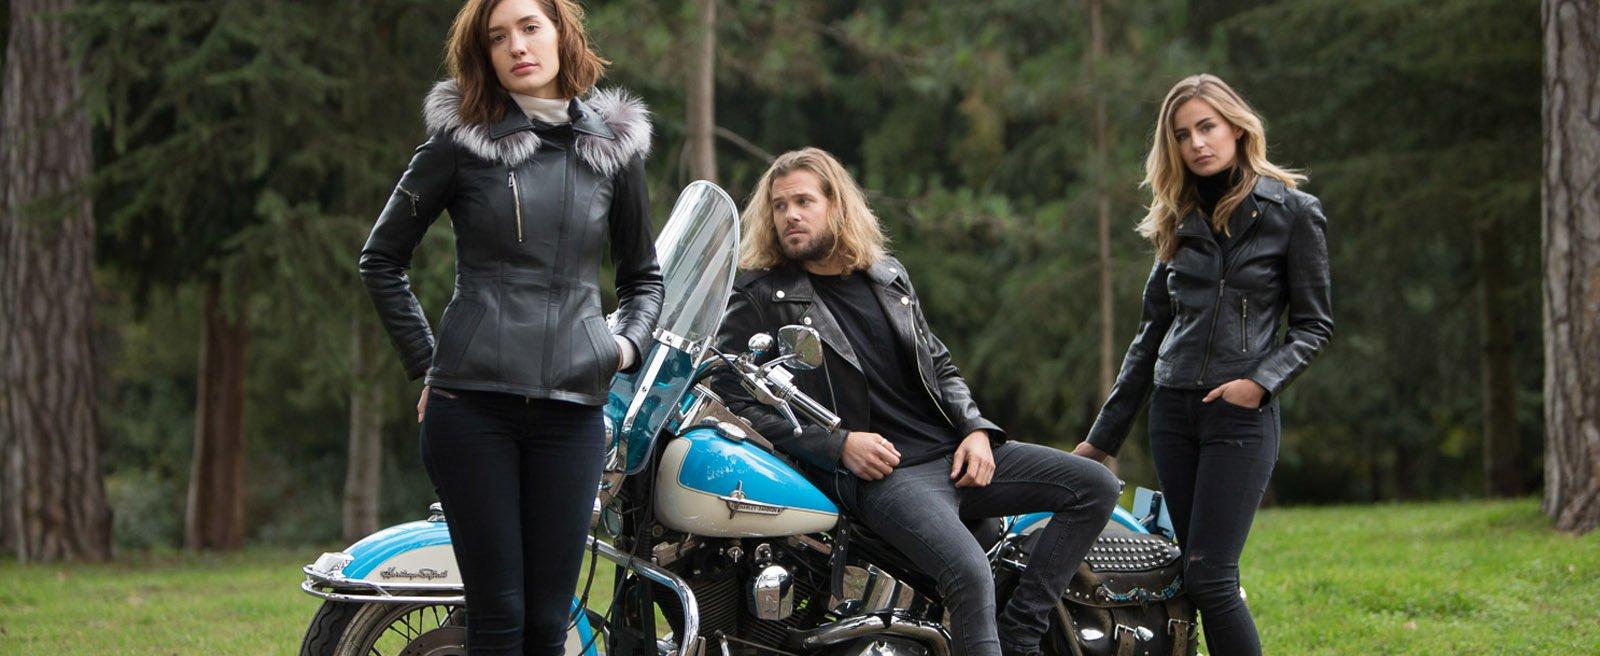 Magasin Forestland : mode homme et femme pas cher à Channel Outlet Store